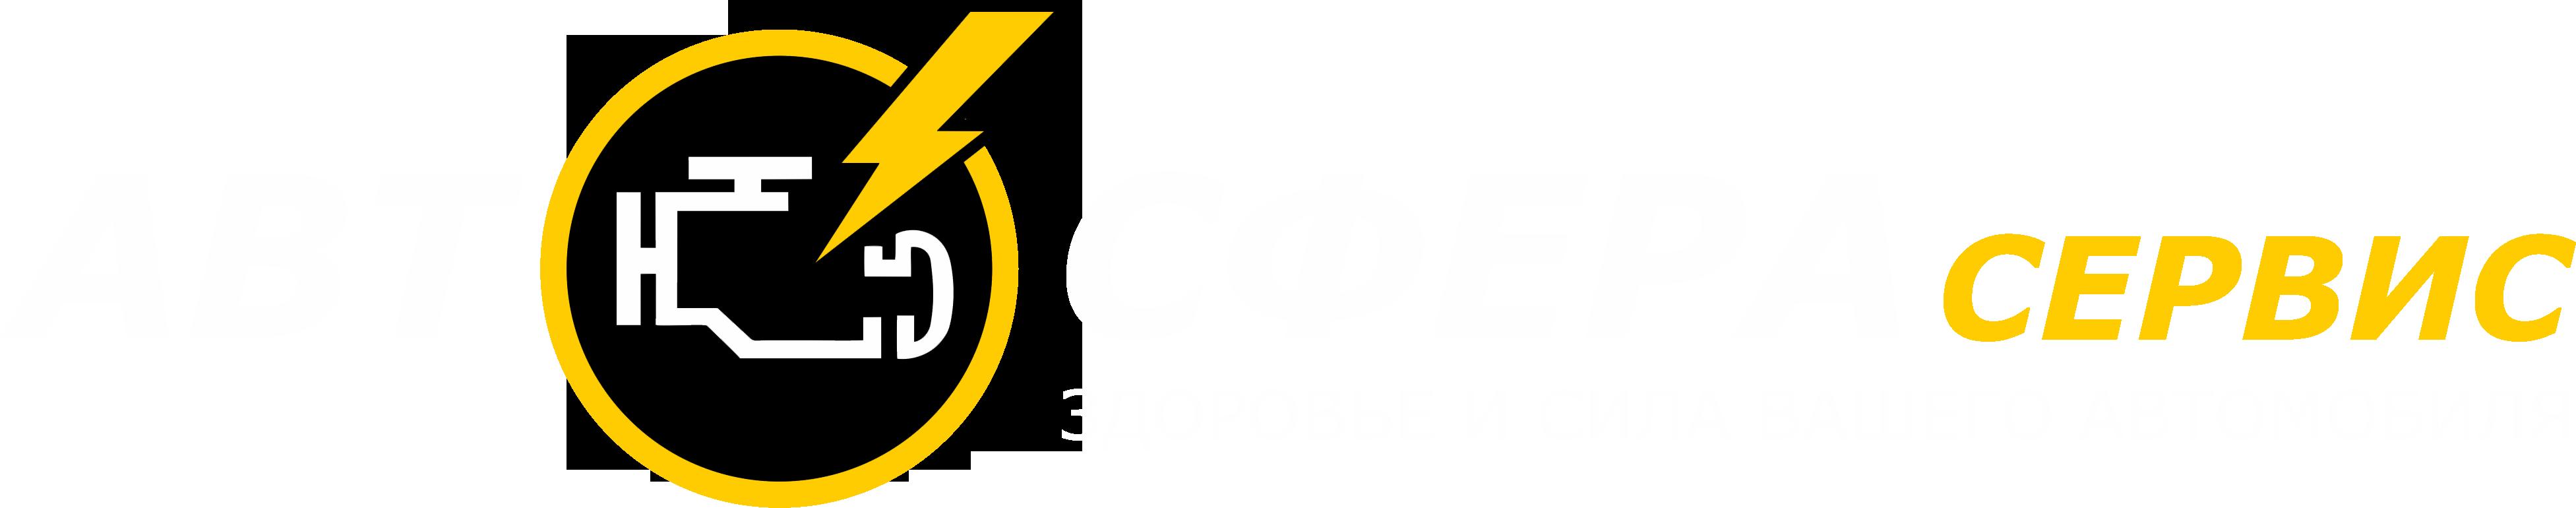 avtosfera service logo white